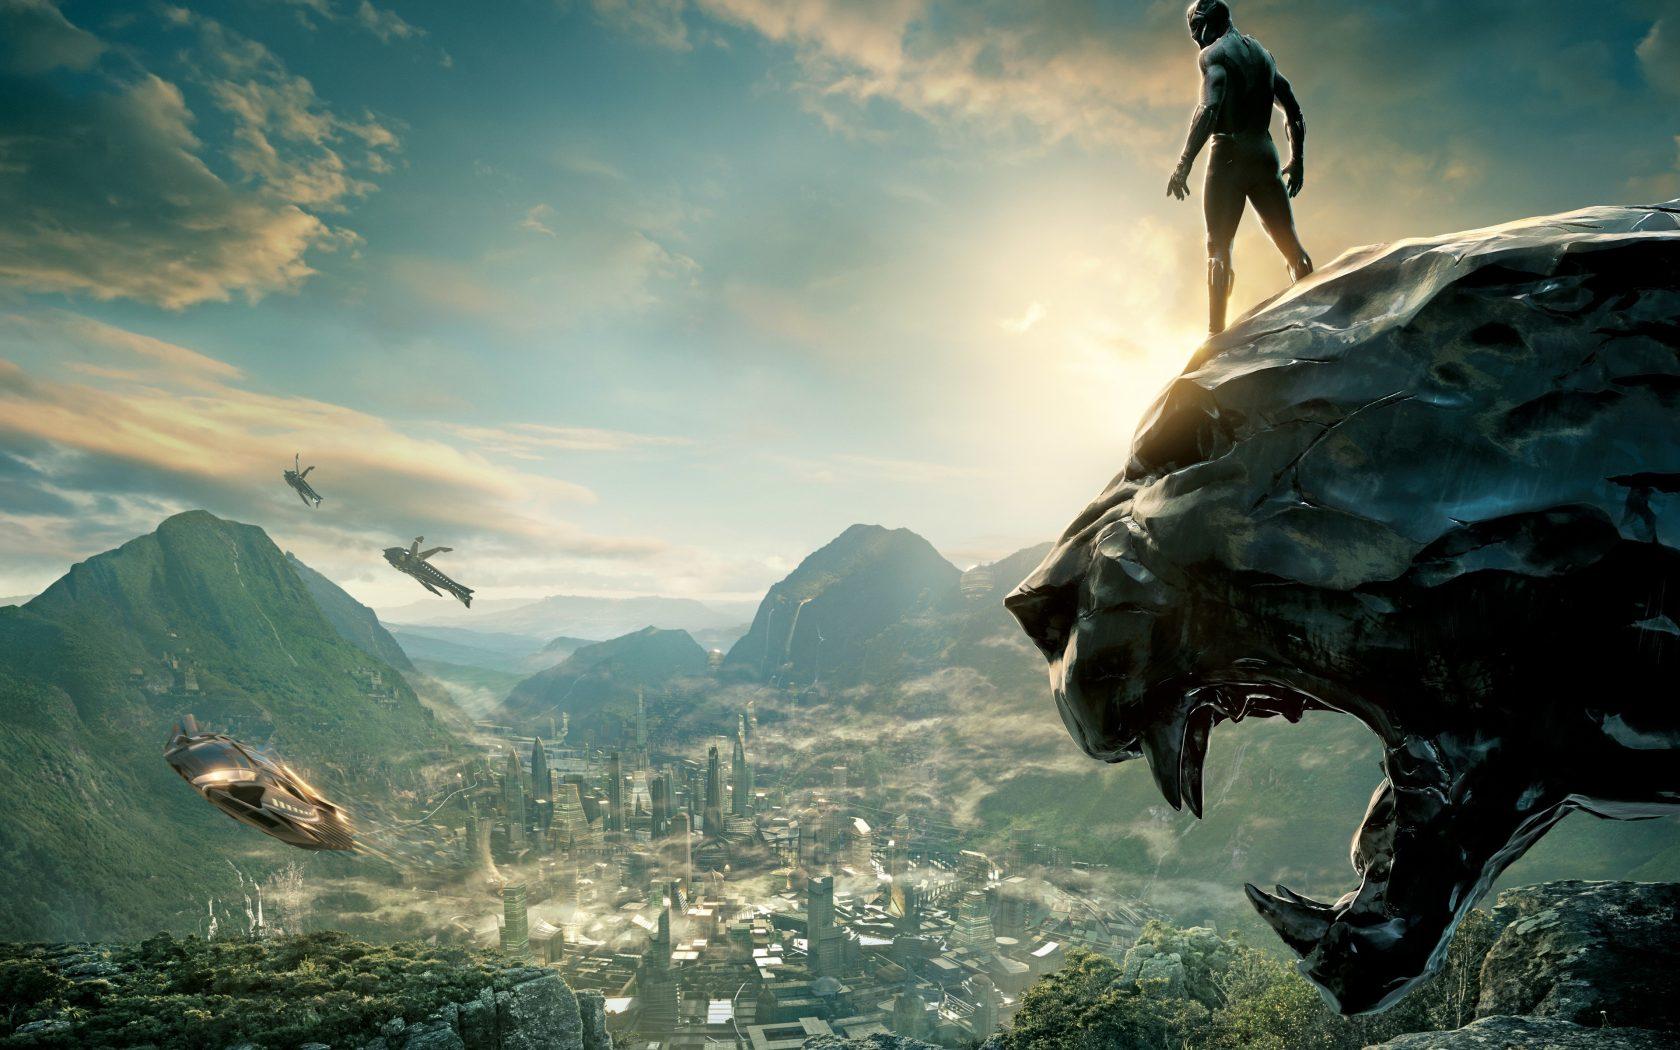 Black Panther 2018 Wallpaper Download For Desktop in HD 4K 1680x1050